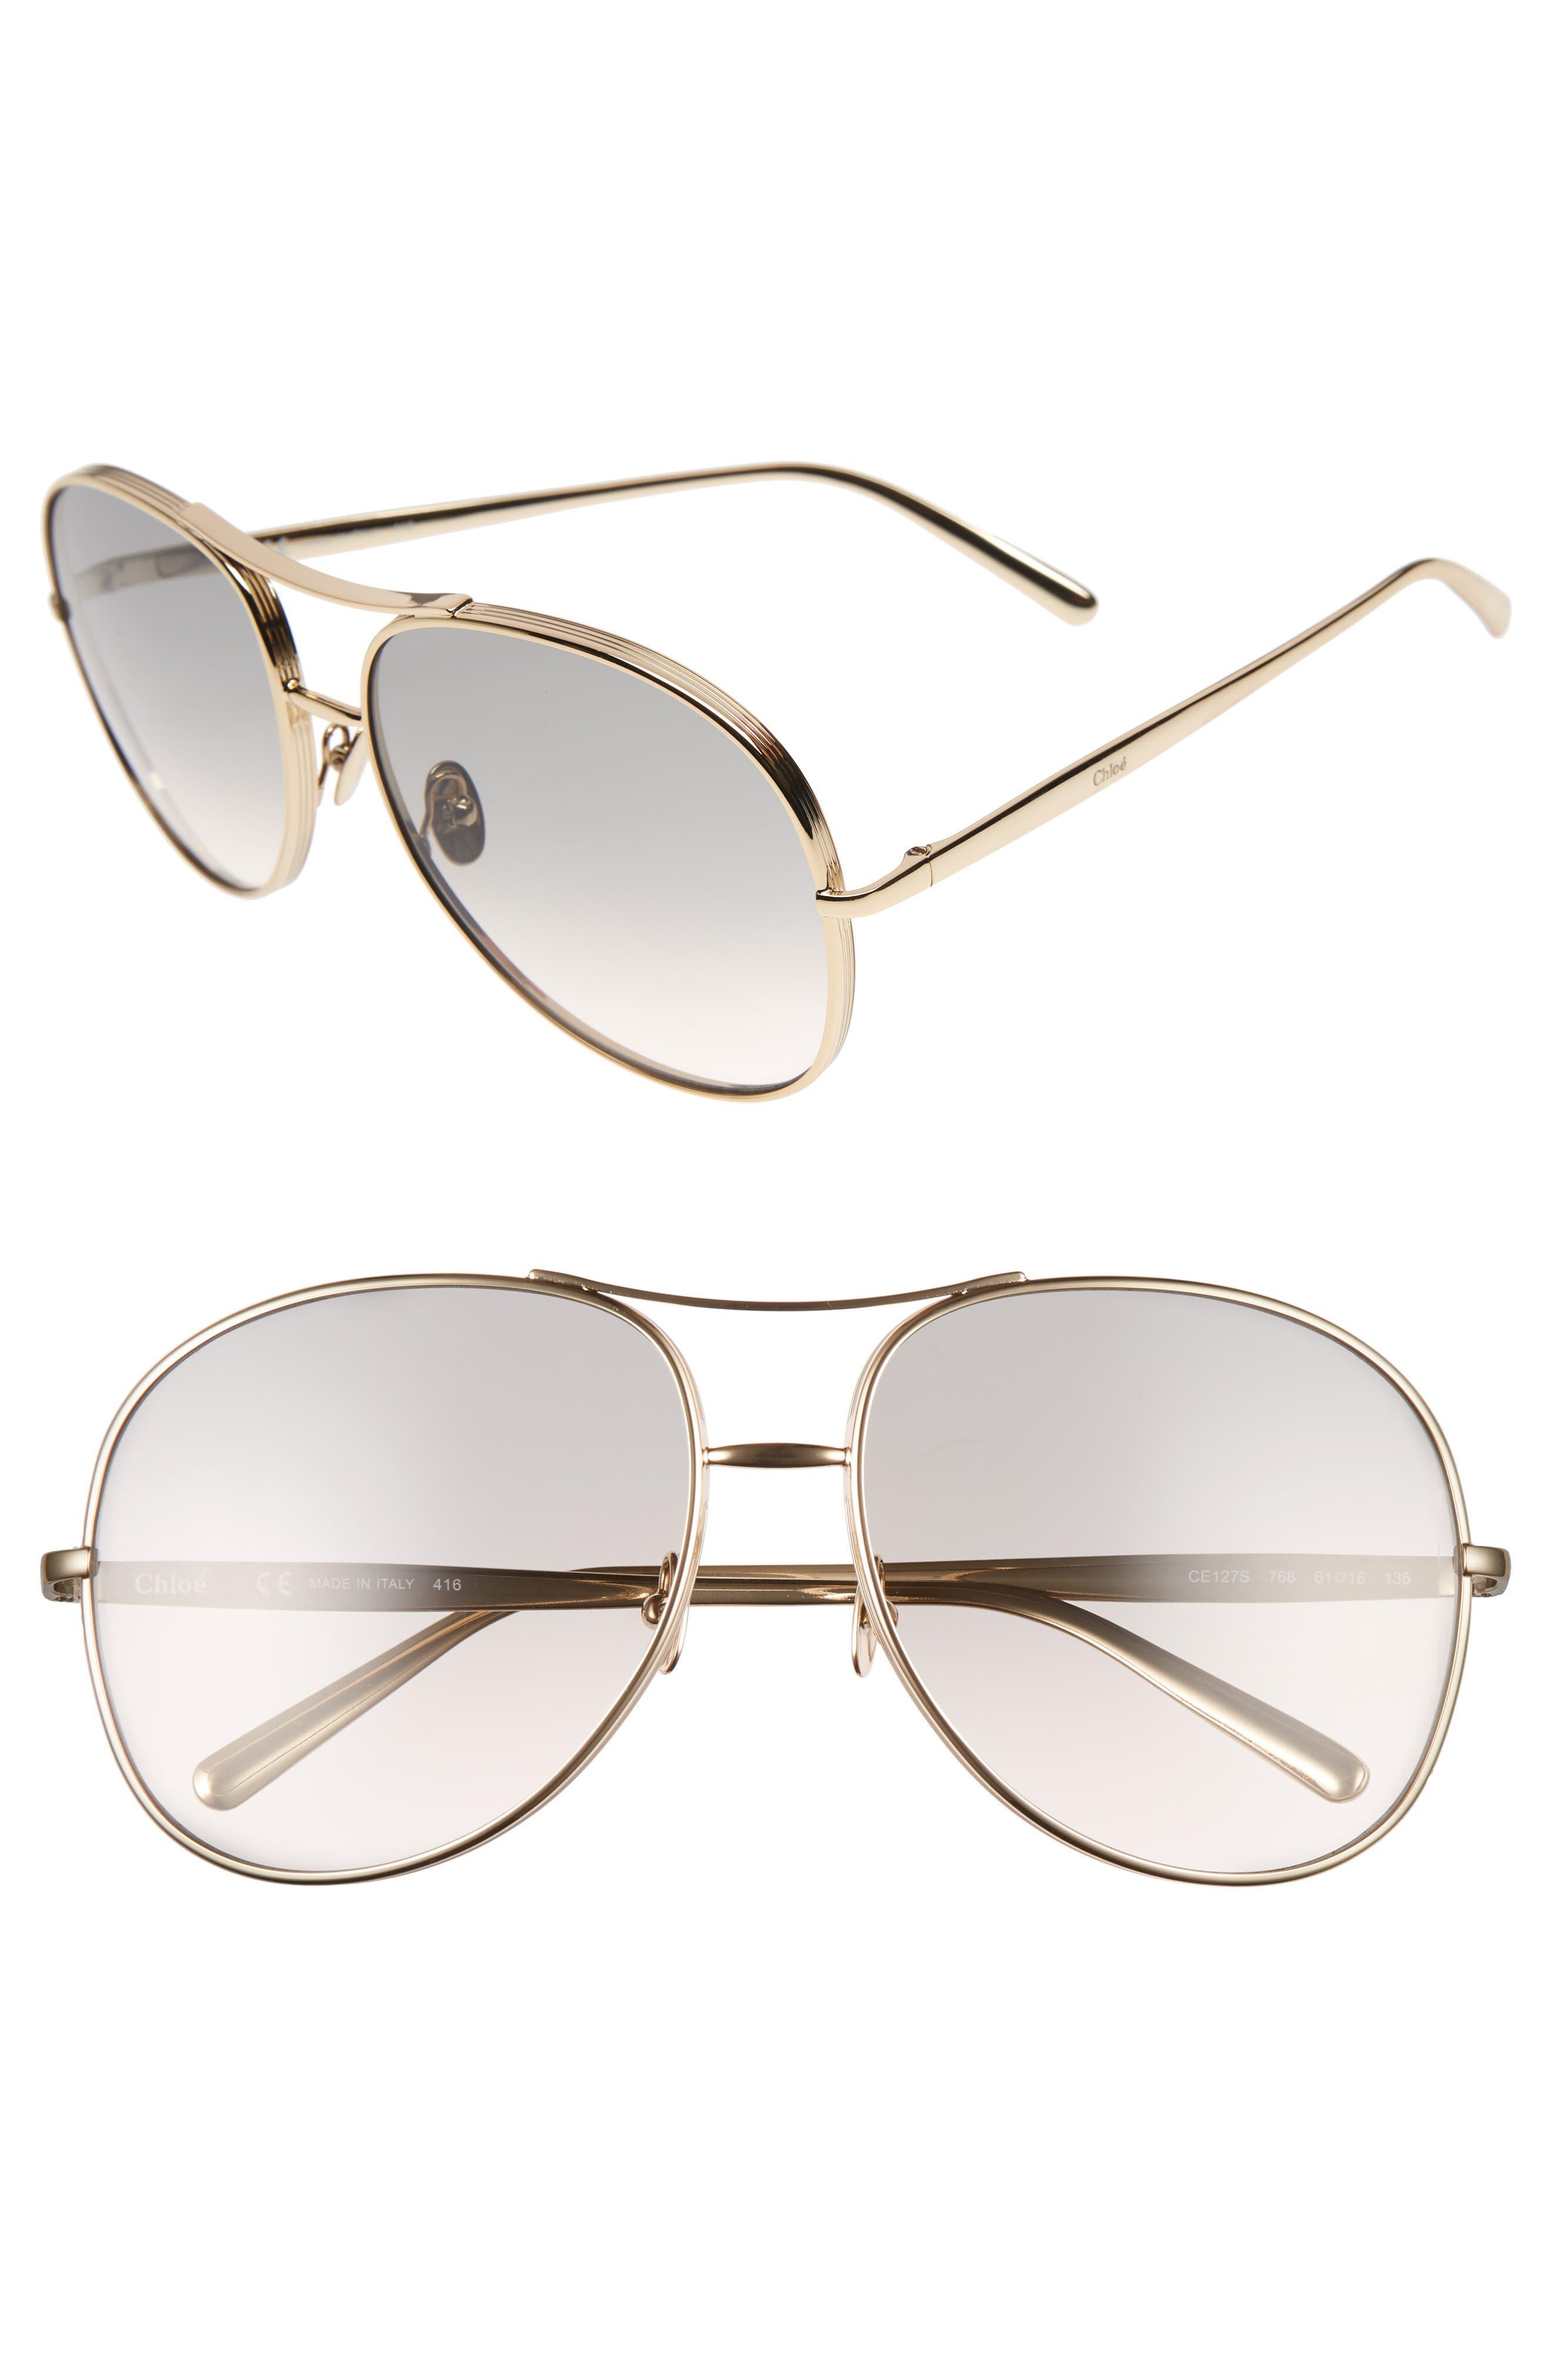 61mm Oversize Sunglasses,                             Main thumbnail 3, color,